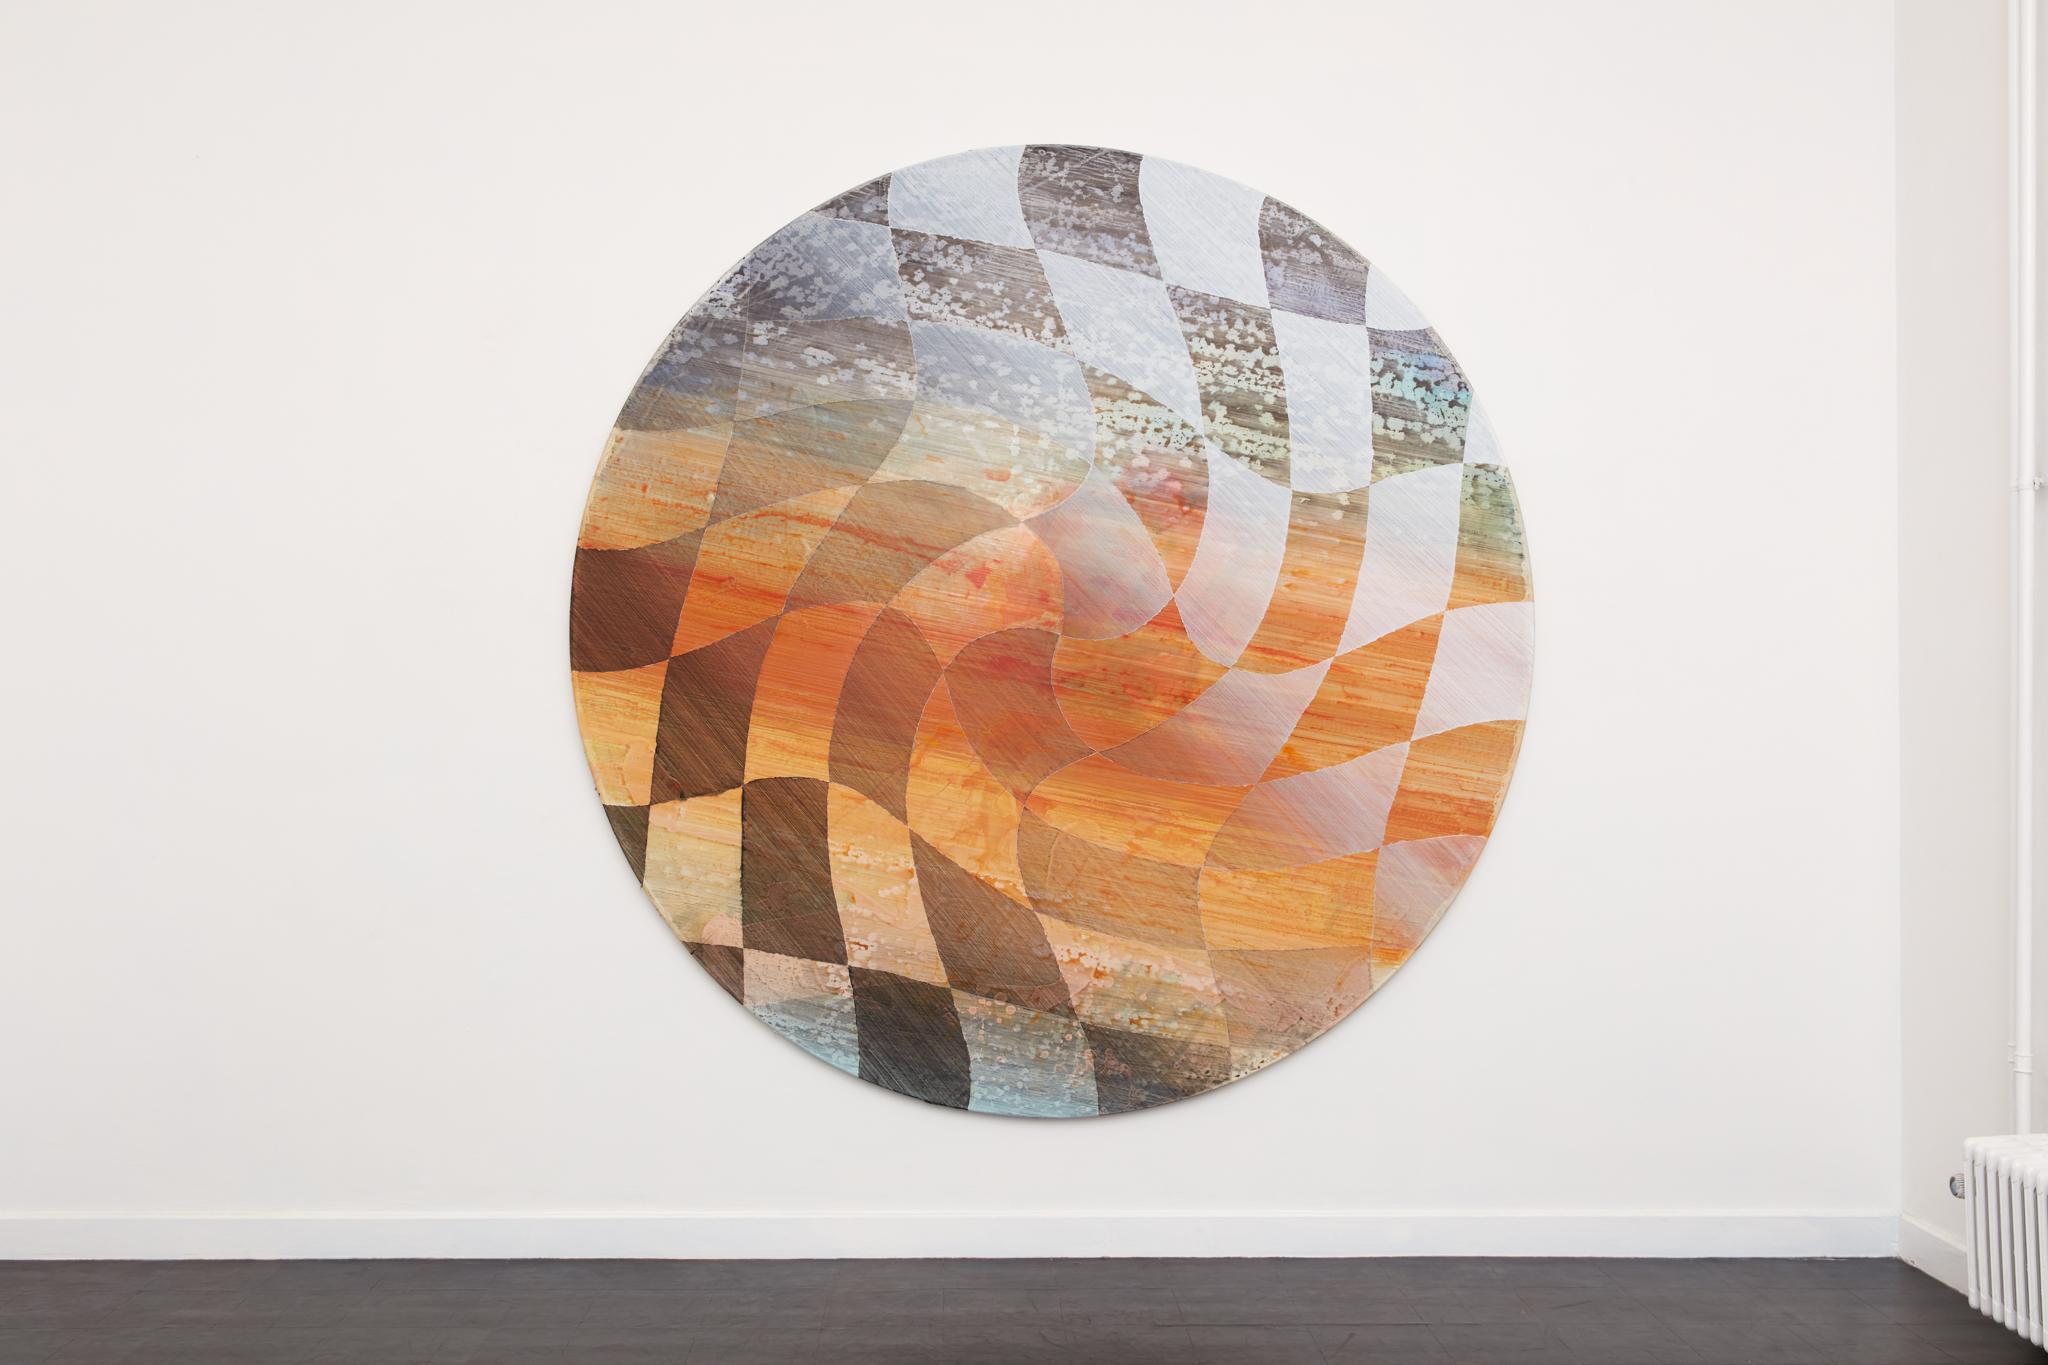 Rik Moens - Untitled, 2020